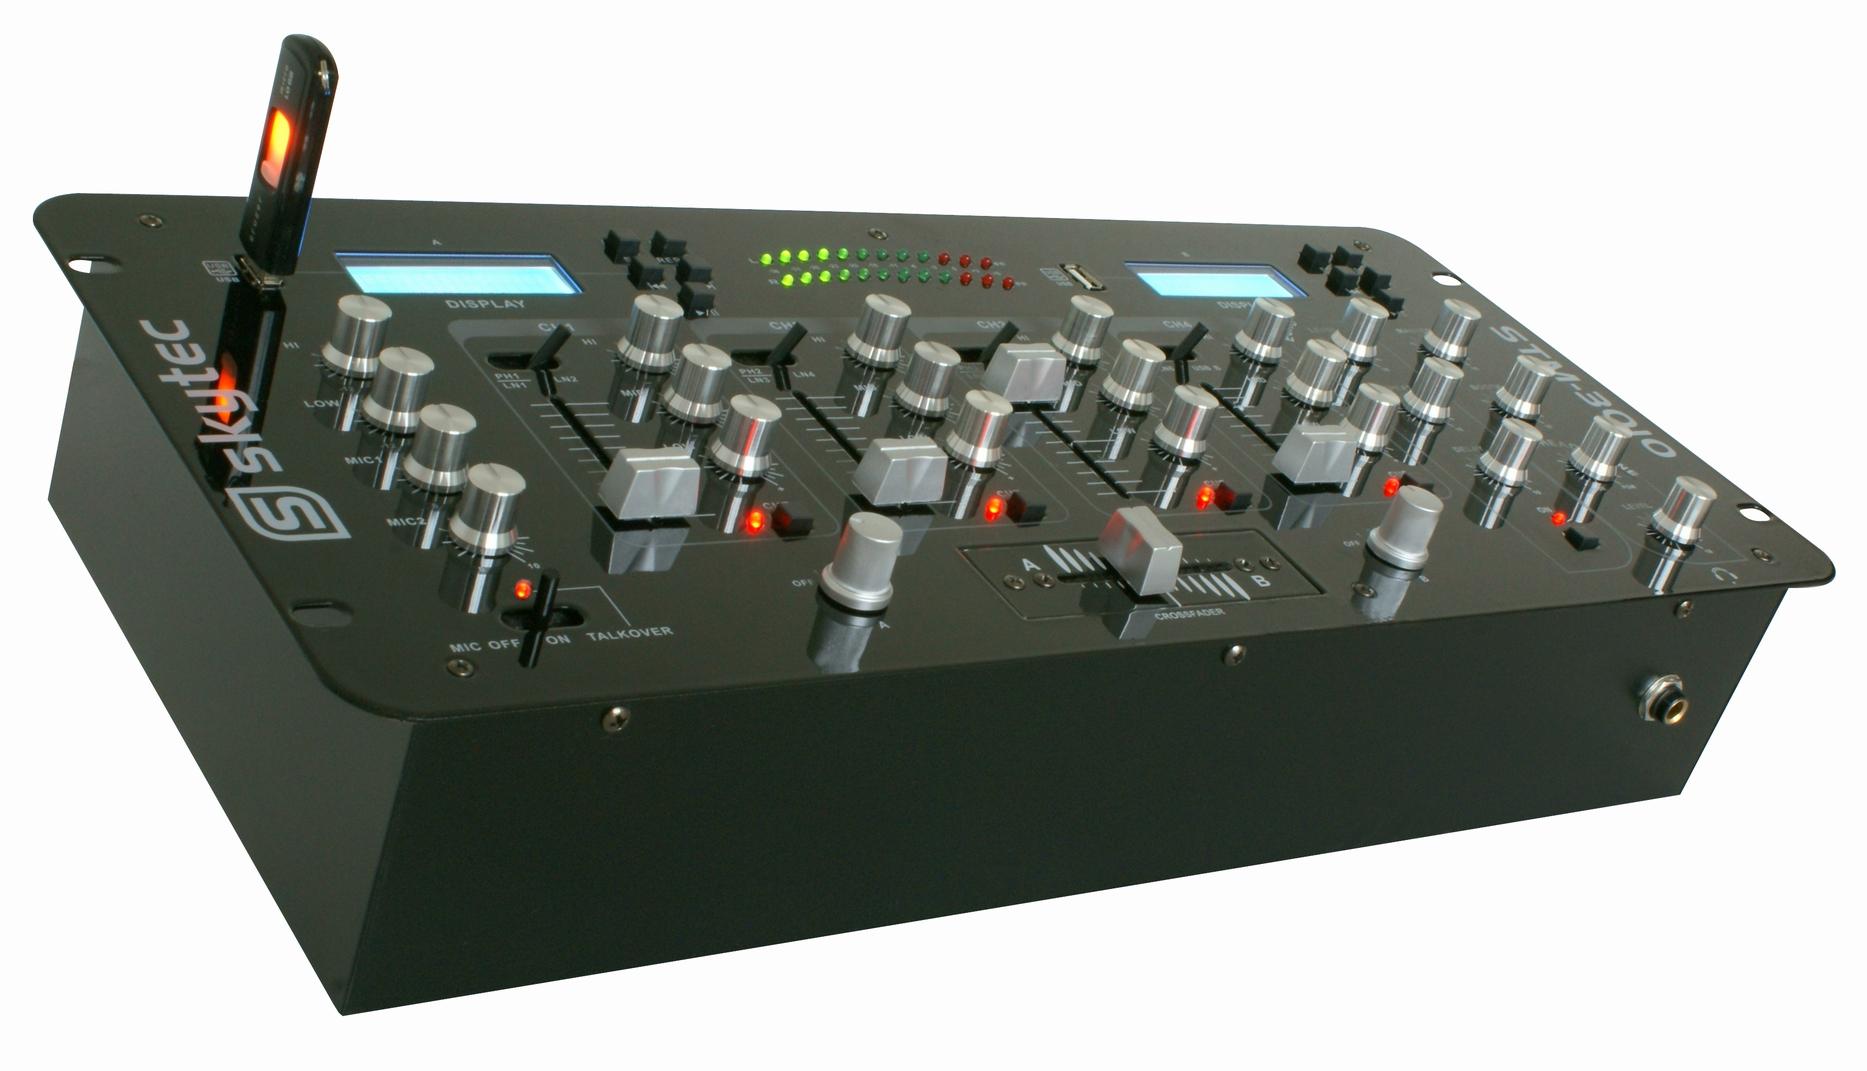 Skytec STM-3010 USB